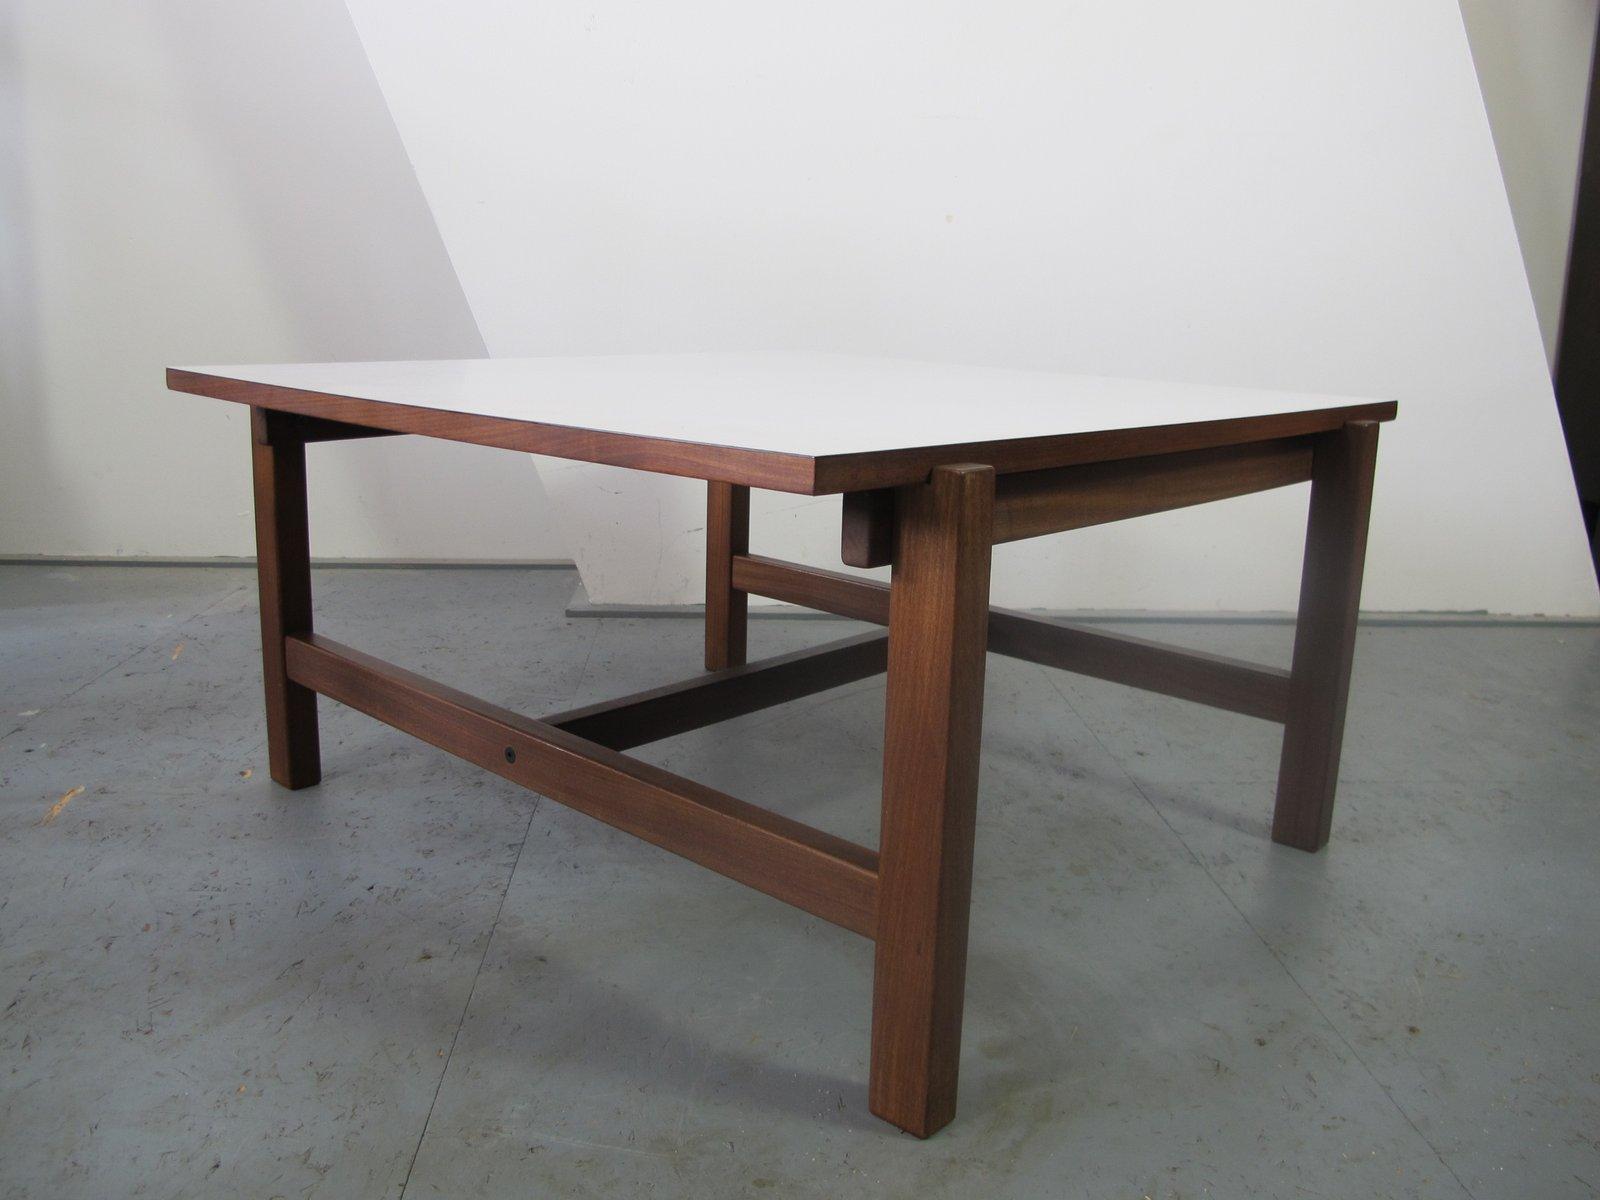 table basse vintage reversible en teck et formica de pastoe en vente sur pamono. Black Bedroom Furniture Sets. Home Design Ideas